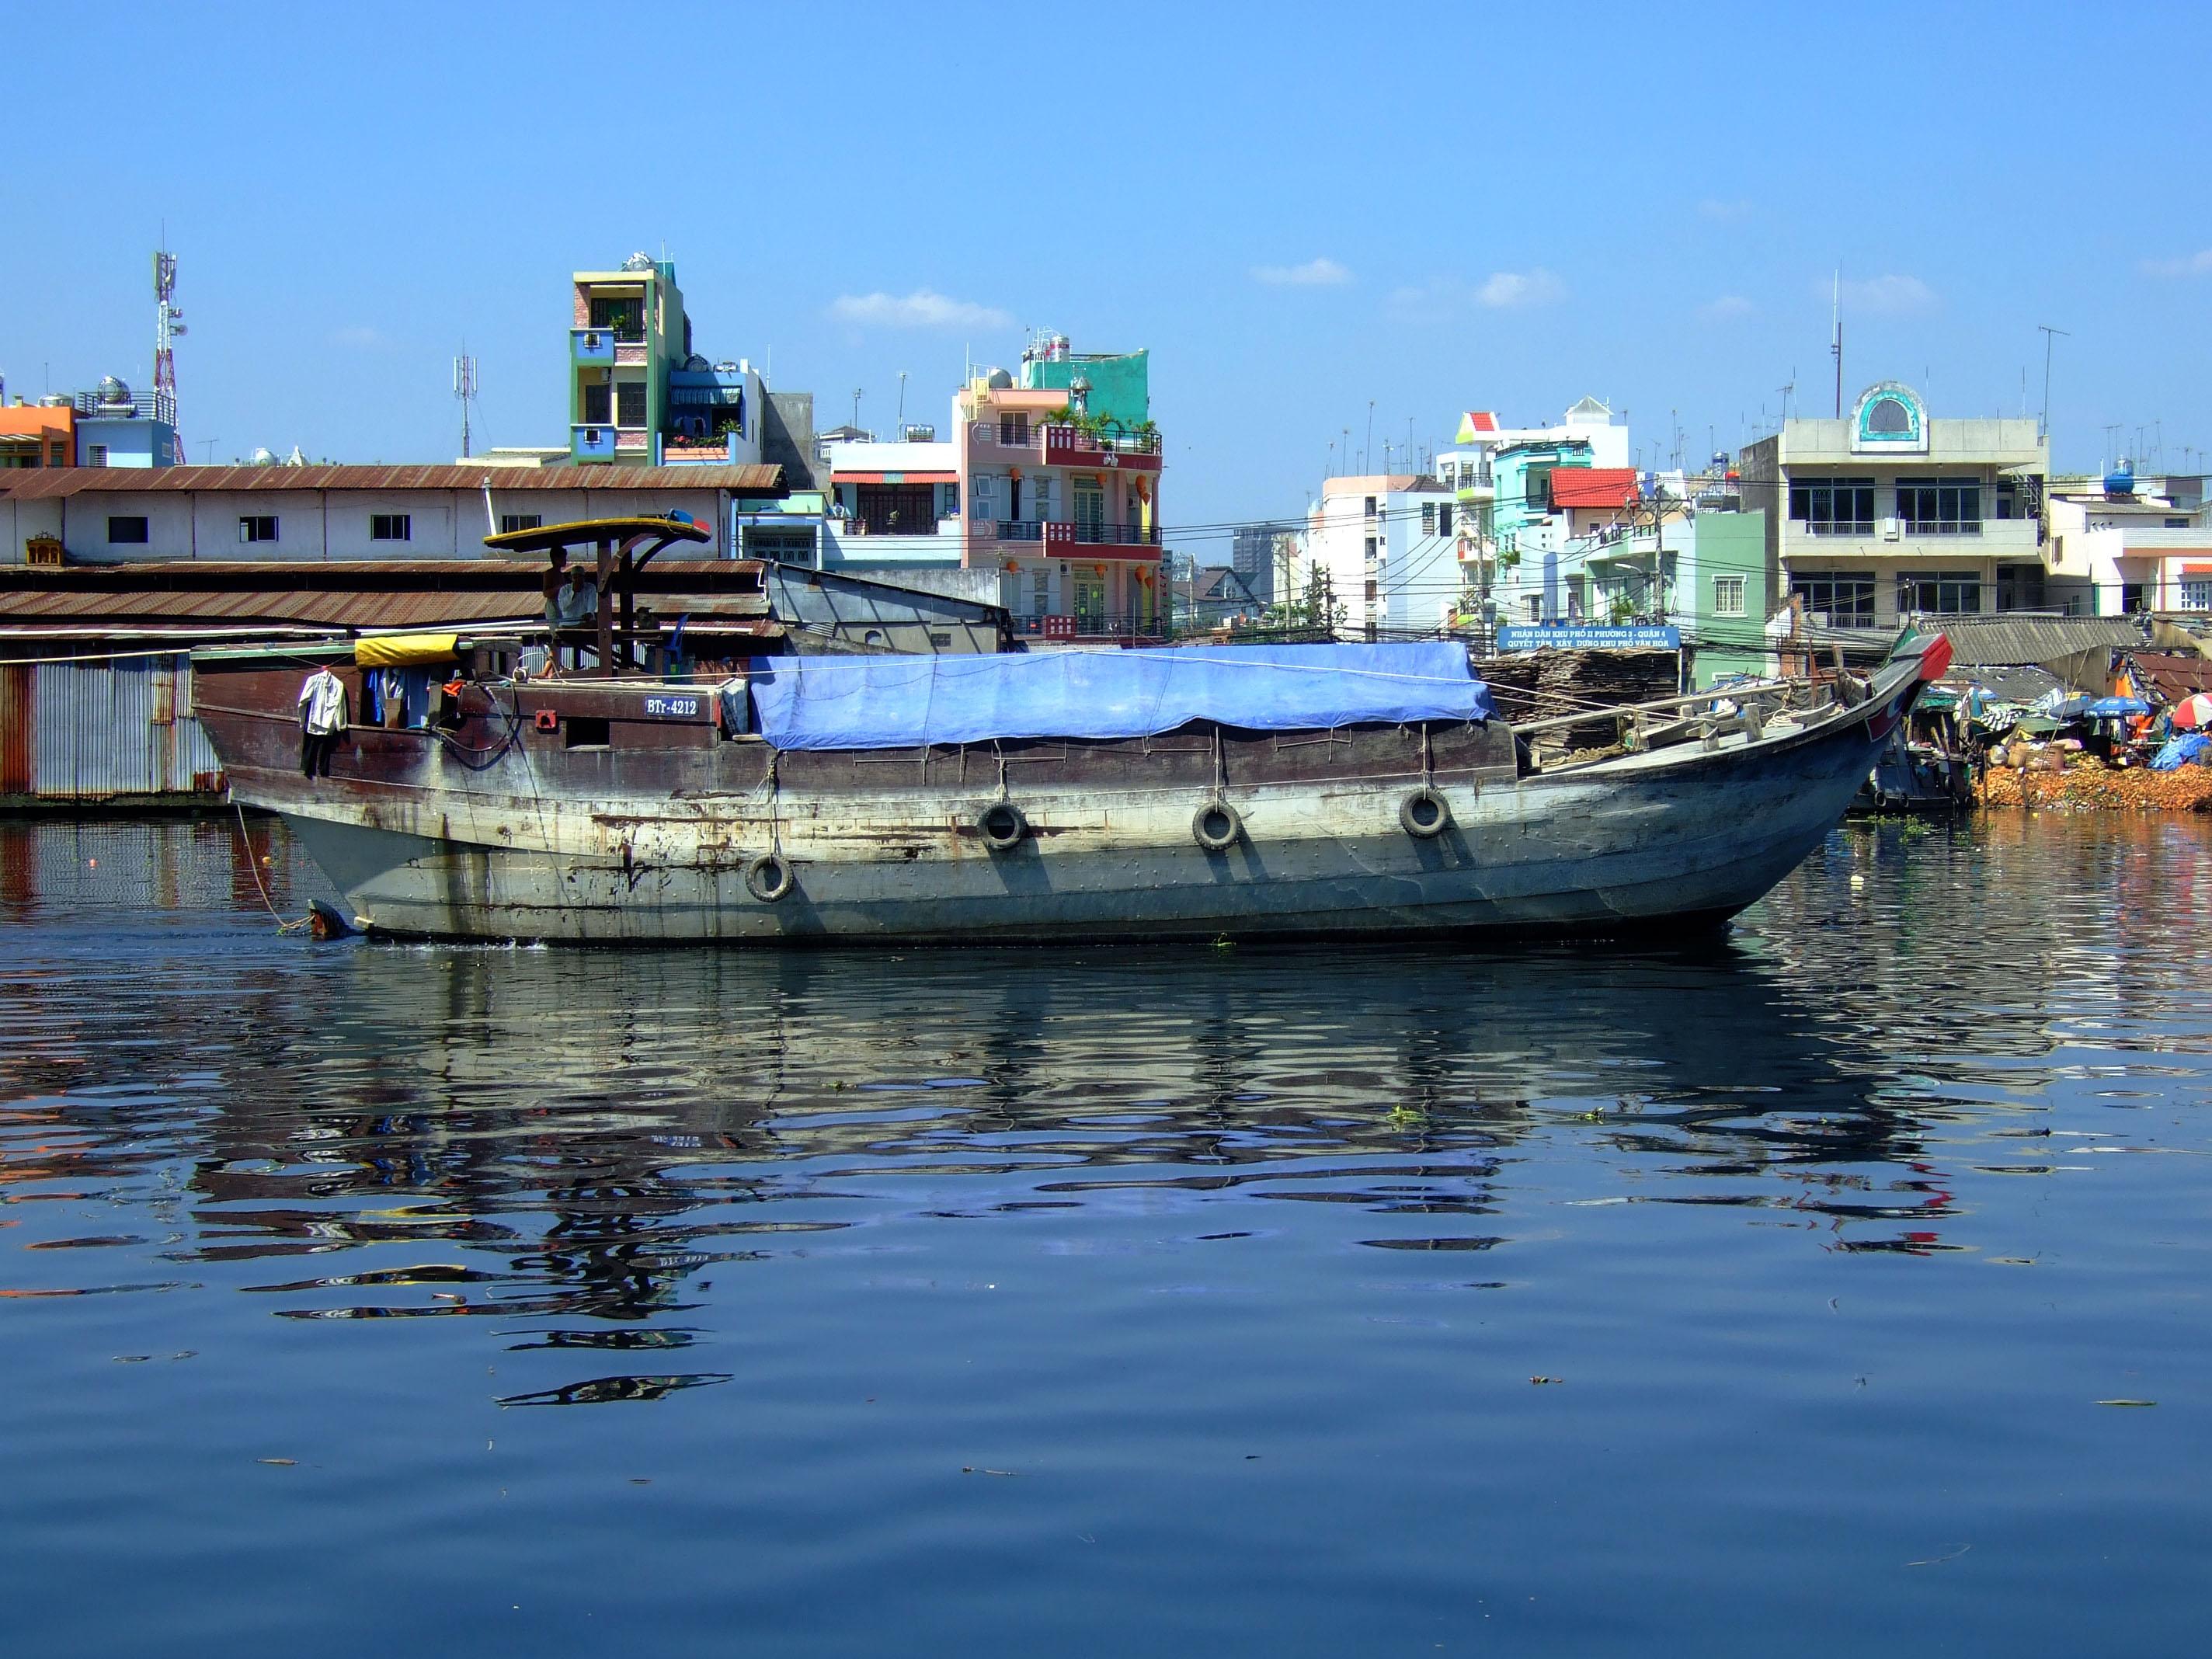 Vietnam Ho Chi Minh City Saigon harbor Ferries boats Feb 2009 05